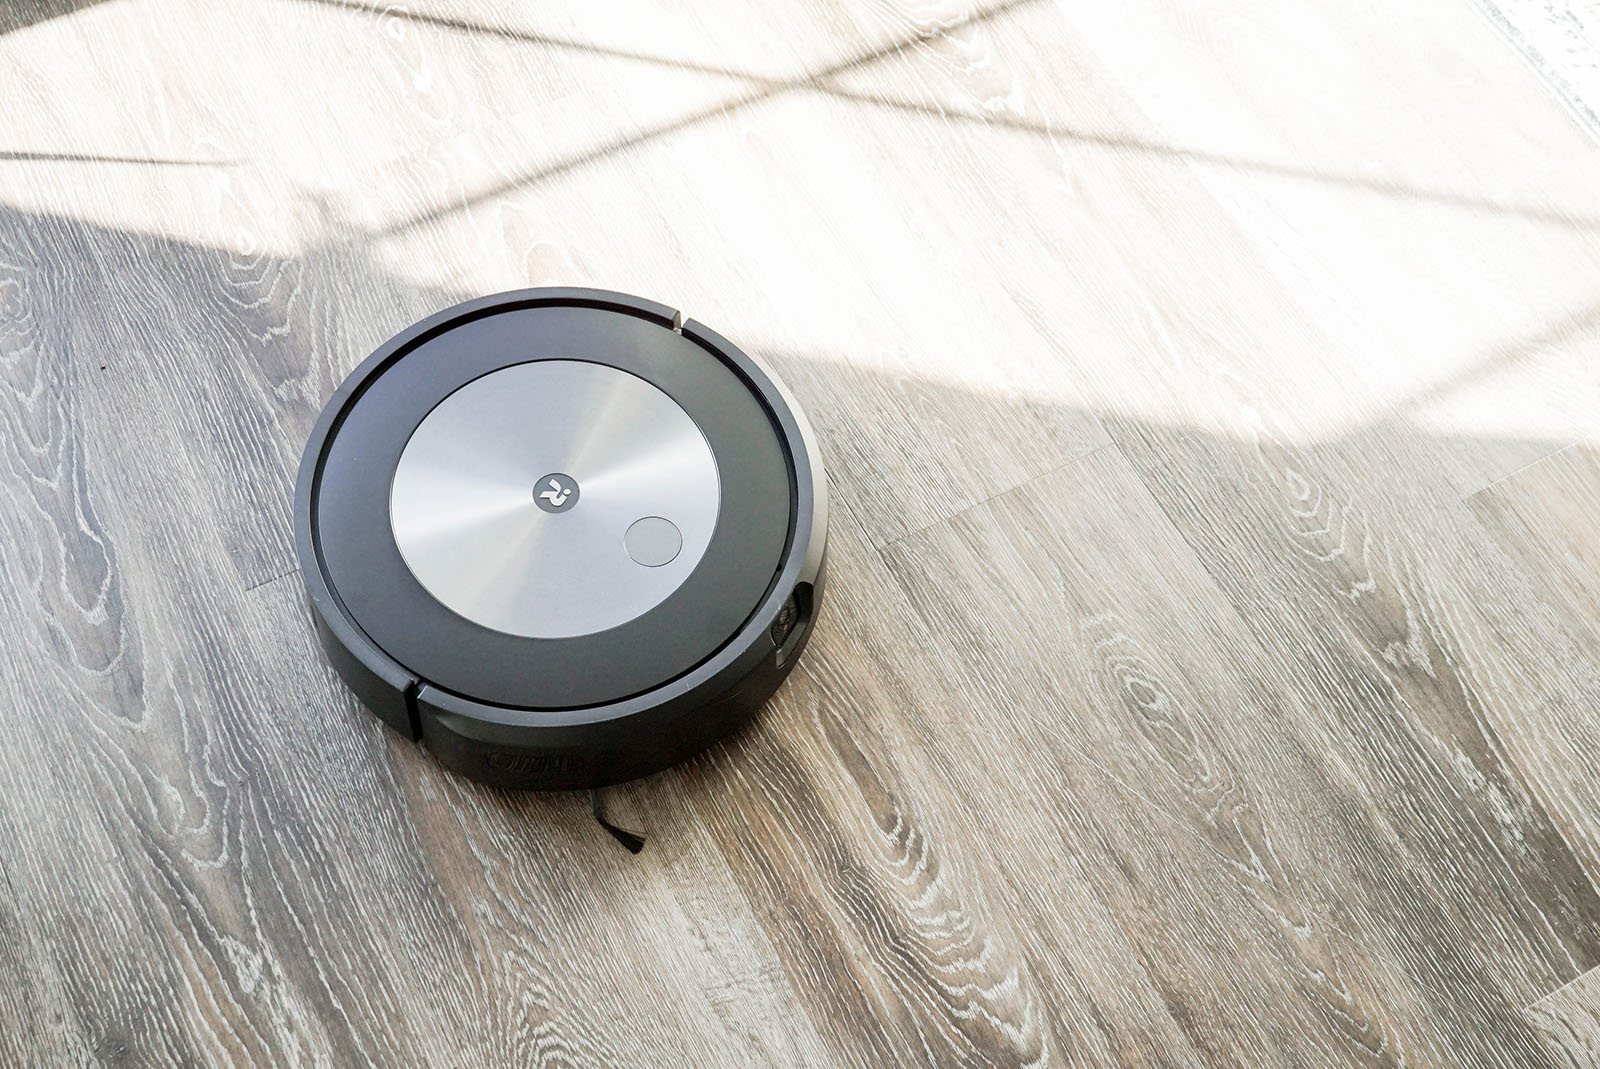 iRobot Roomba j7+ review 6